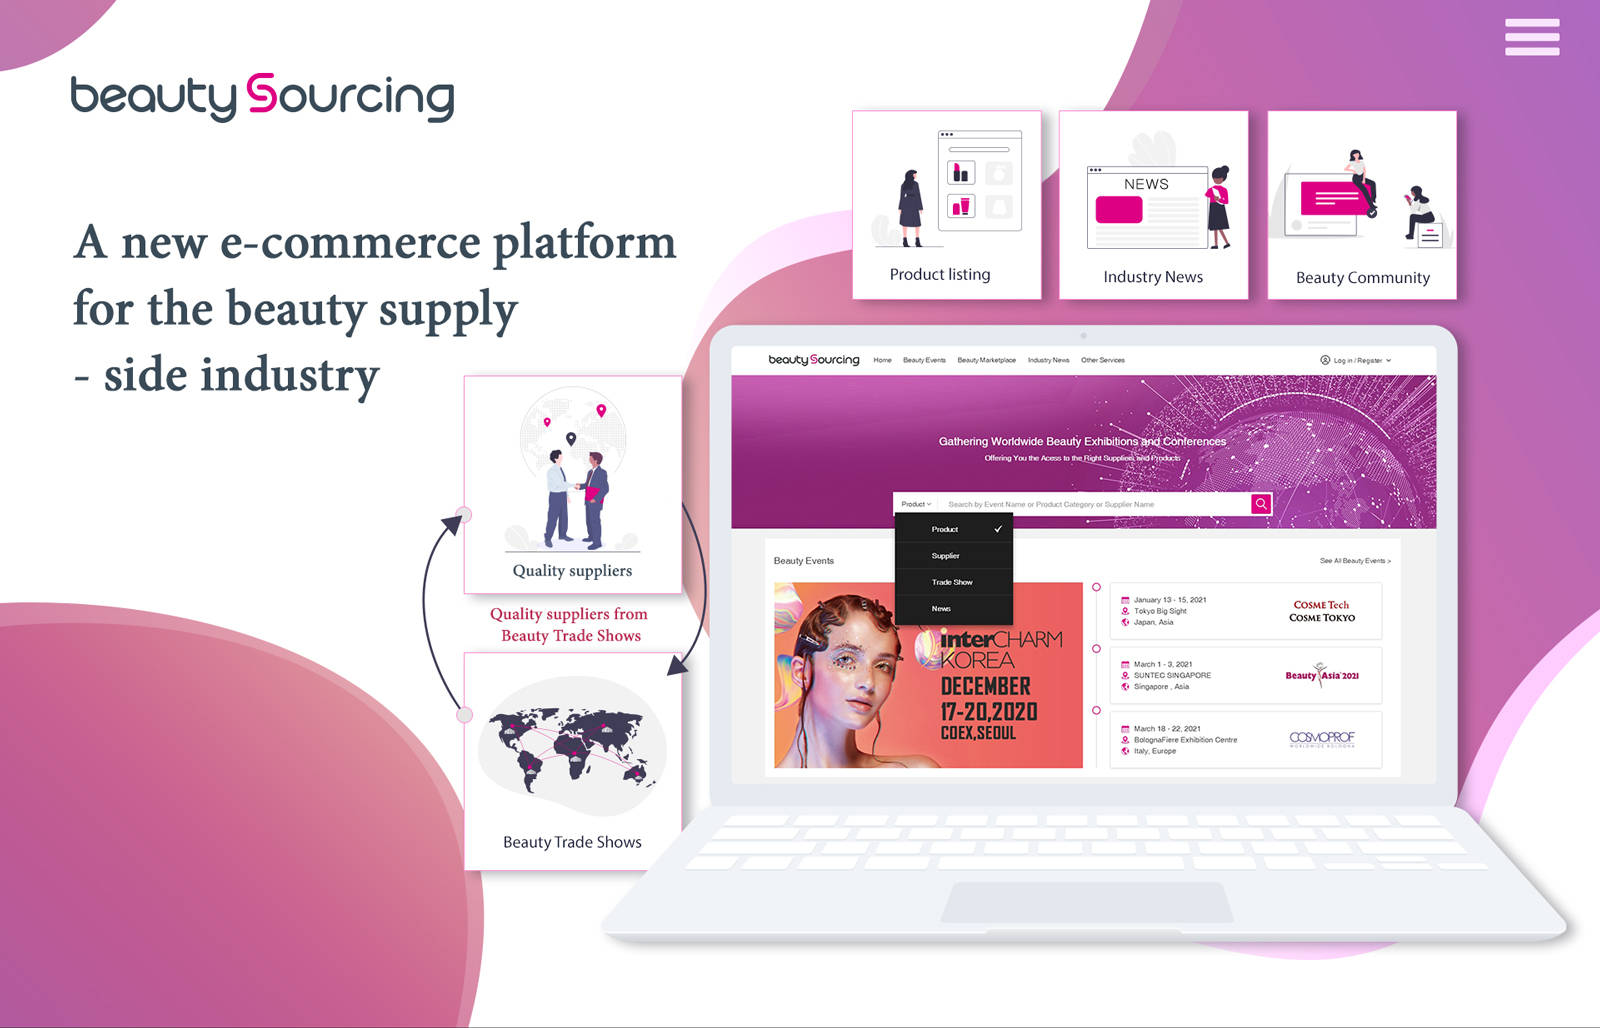 BeautySourcing后疫情时代采购新渠道 美容供应链电商平台